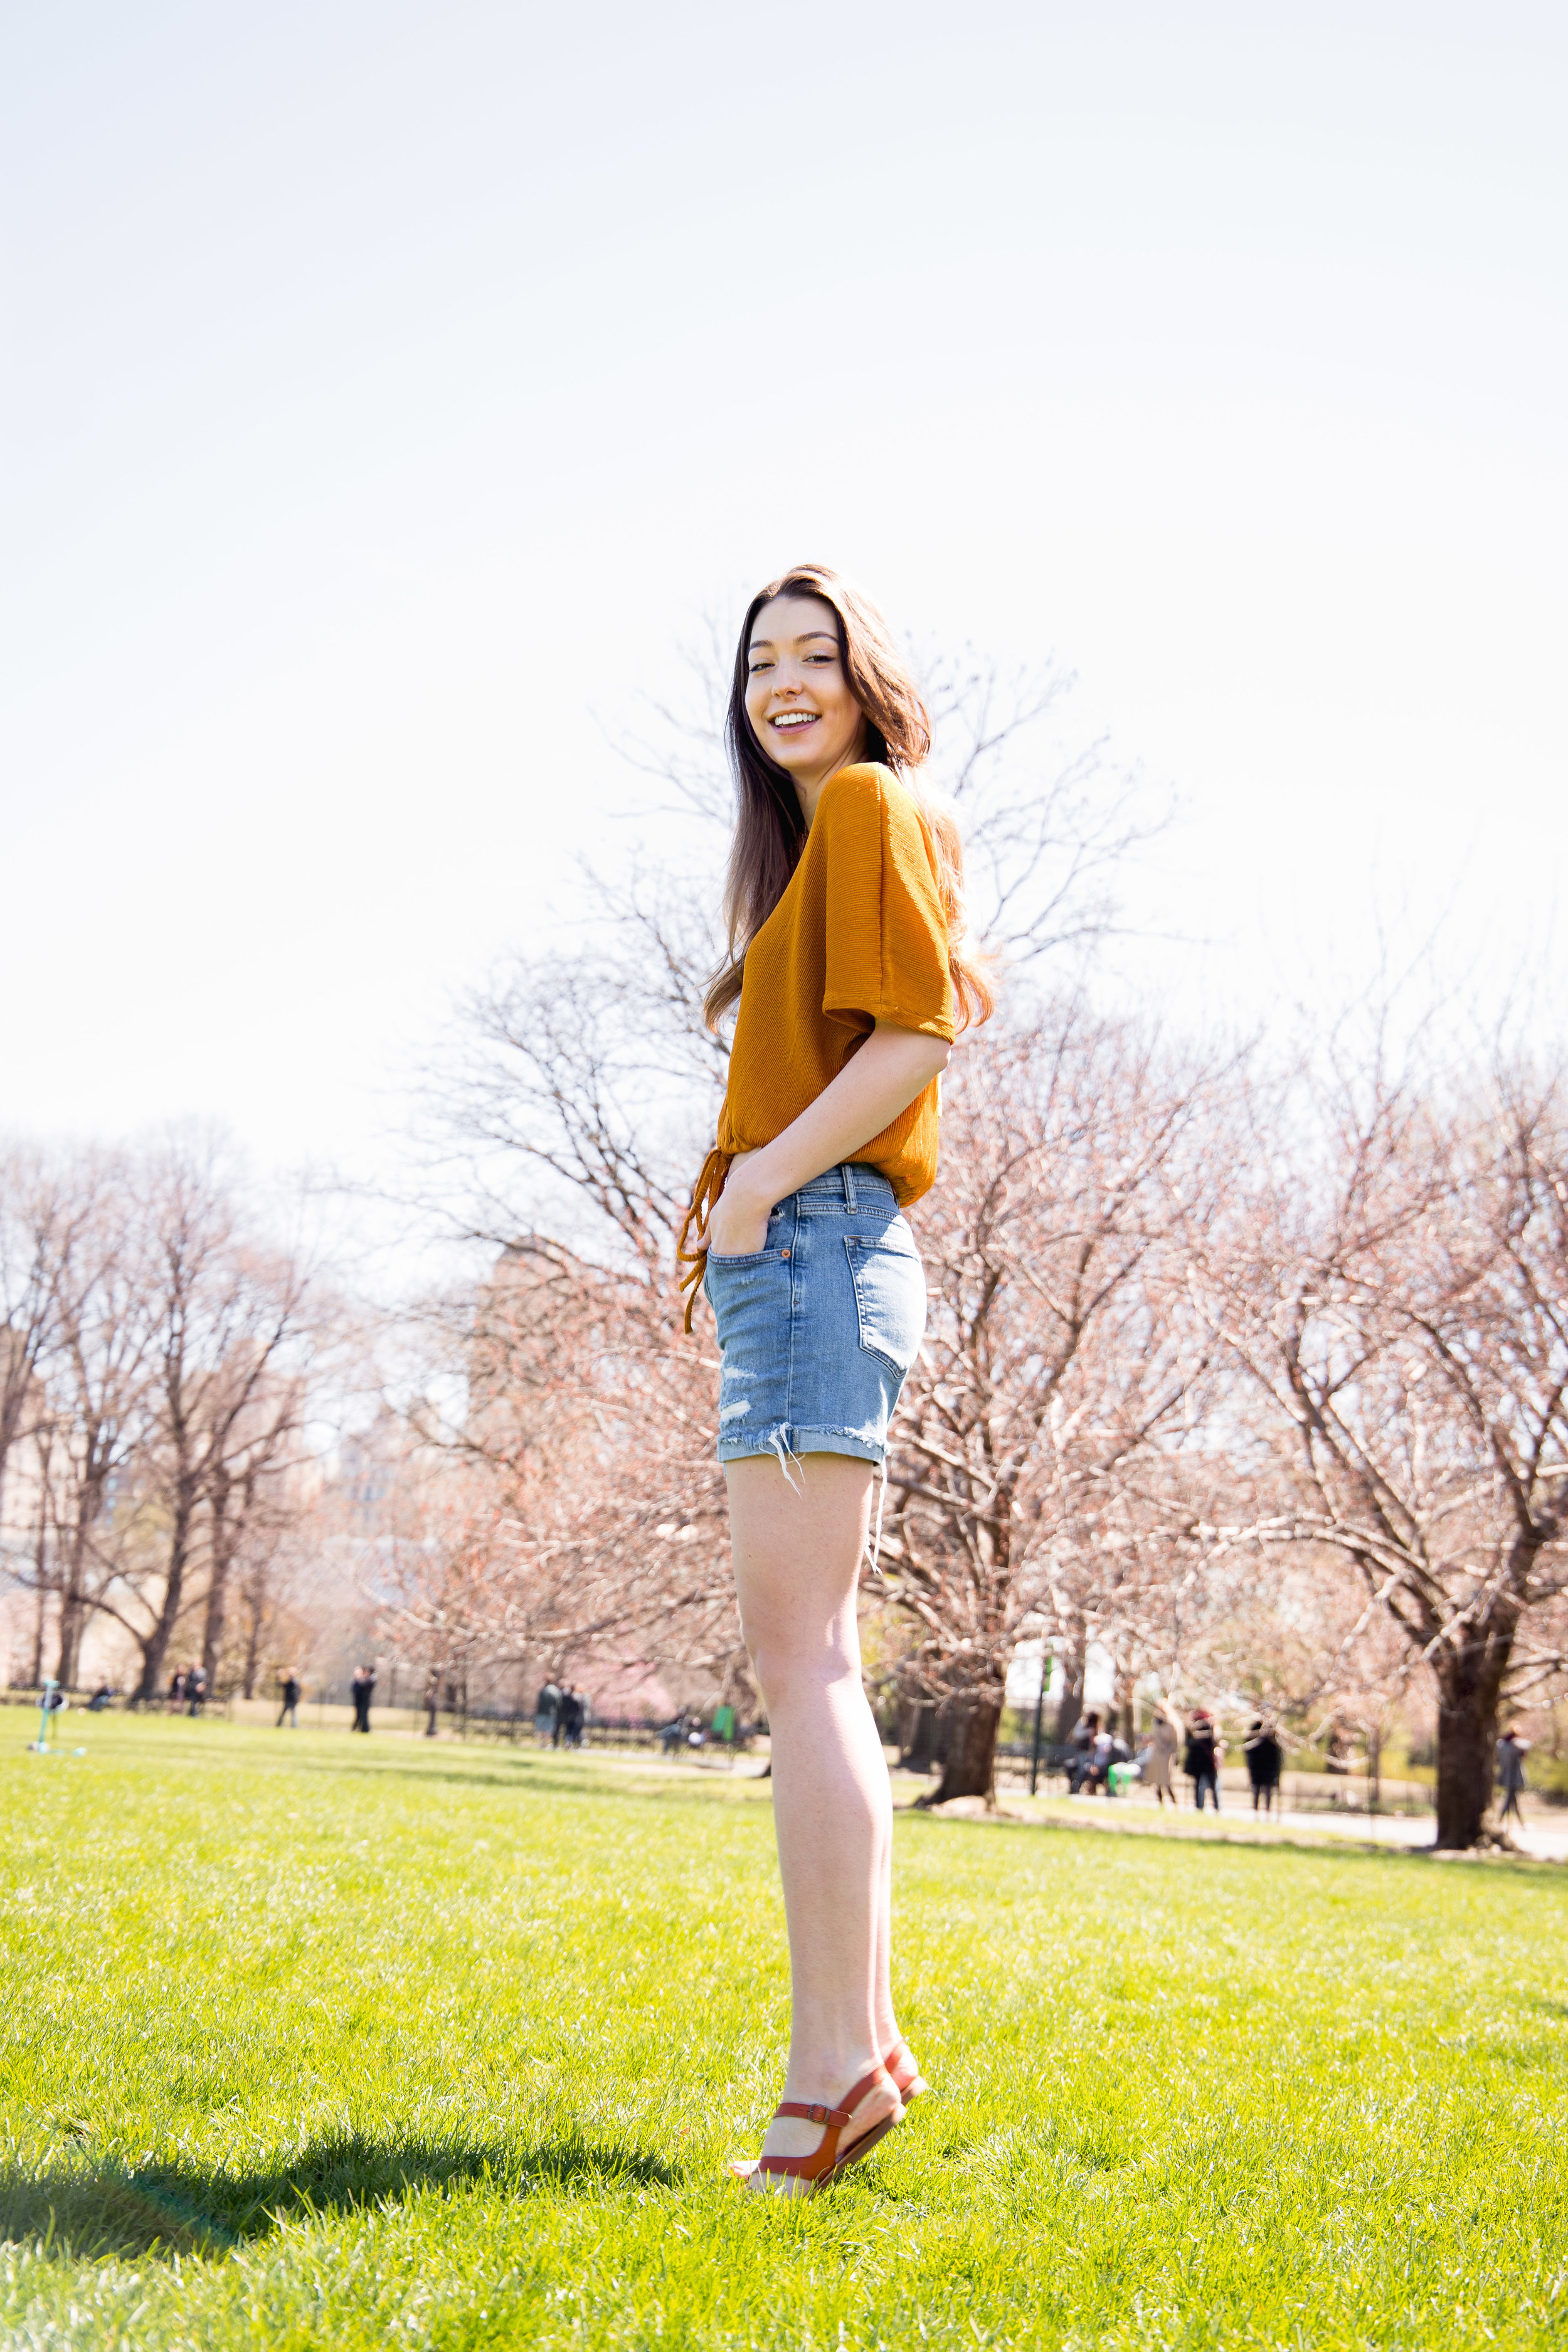 2018_04_21_Samantha_Swenson-1--9.jpg